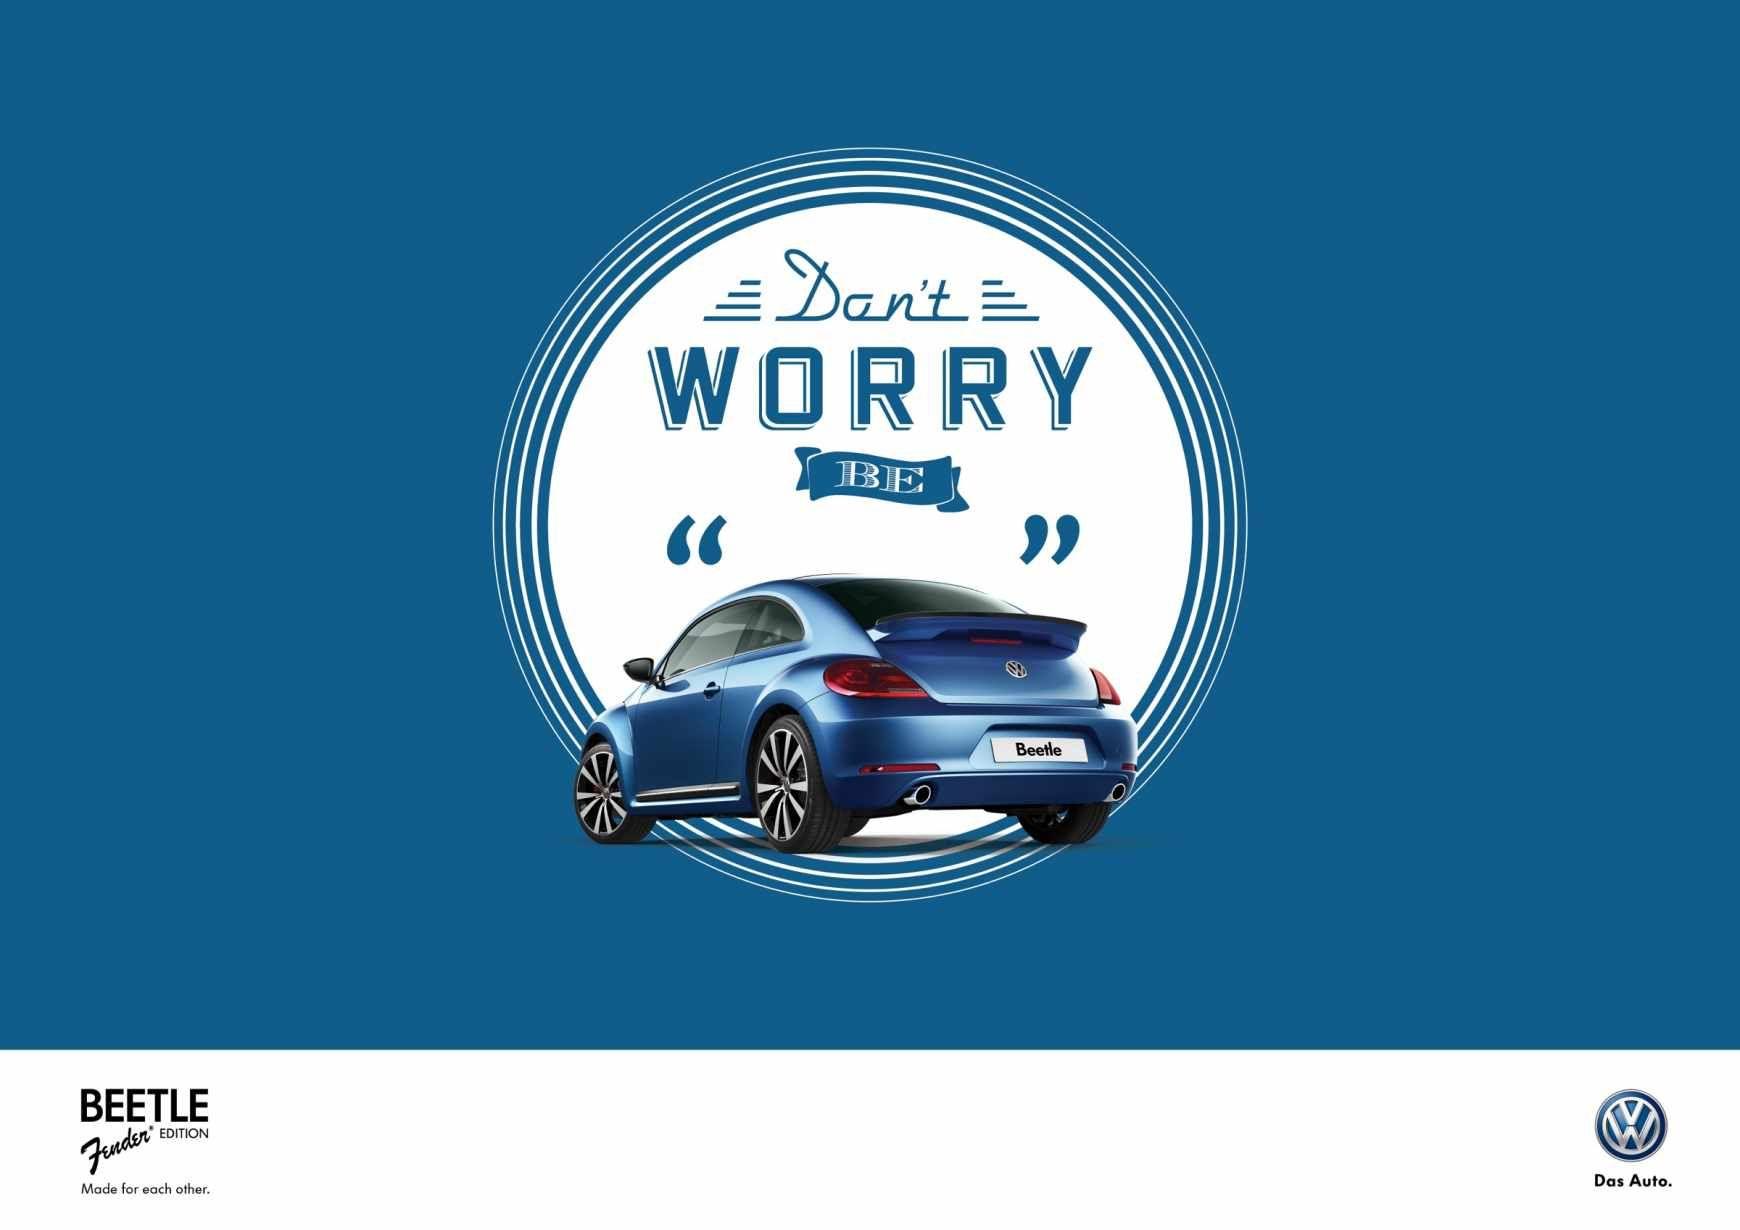 Volkswagen Beetle Don T Worry Be Ads Marketing Creative Print Ads Publicidad Grafica Entre En El Fa Volkswagen Beetle Volkswagen Graphic Design Logo